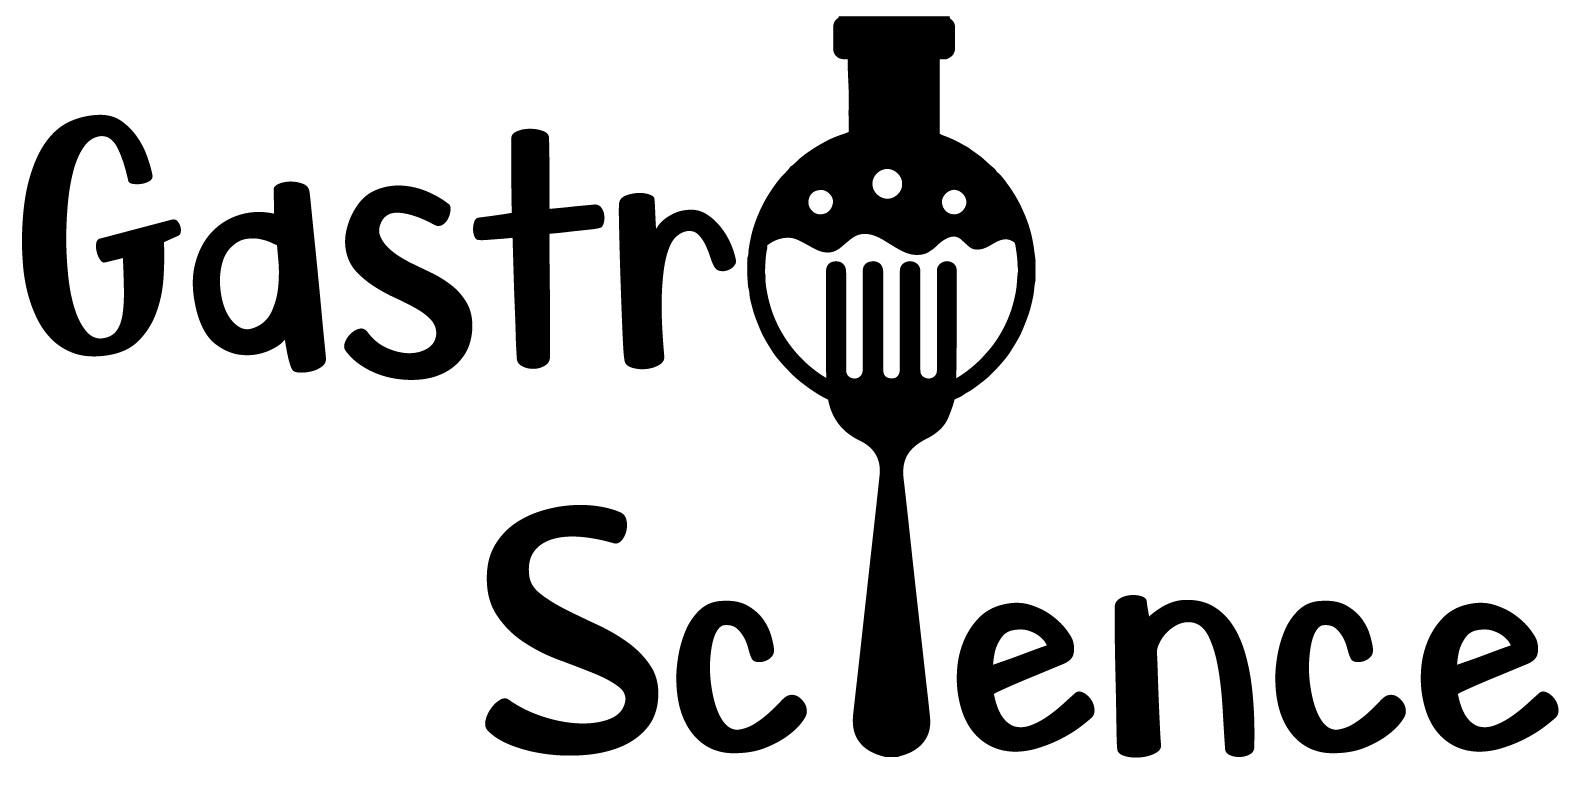 gastro+science-02+%281%29.jpg